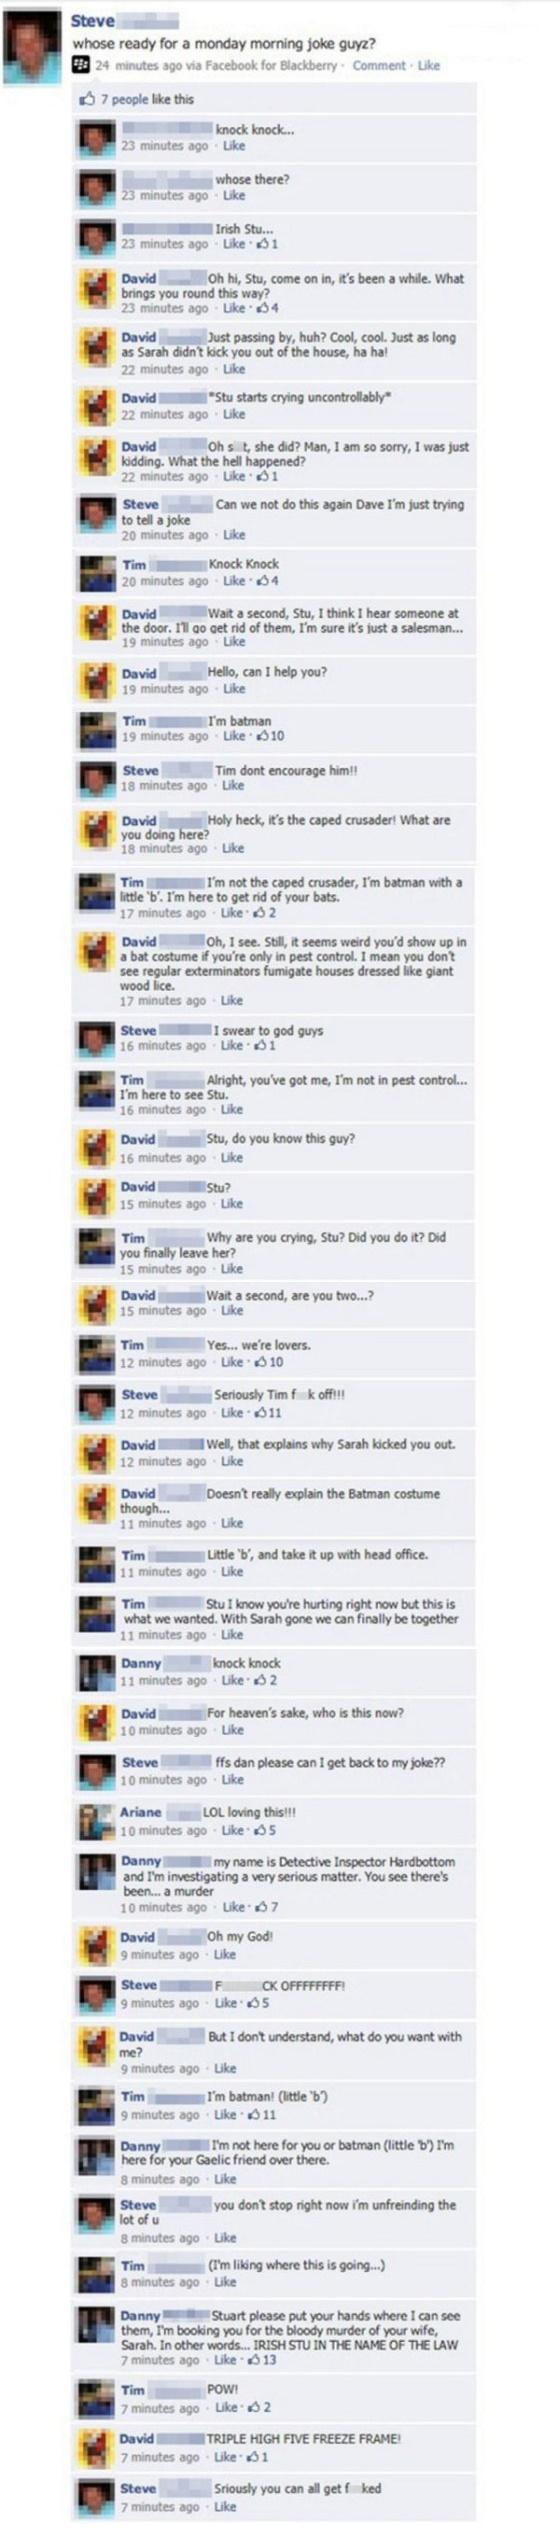 Facebook Knock, Knock Joke Viral